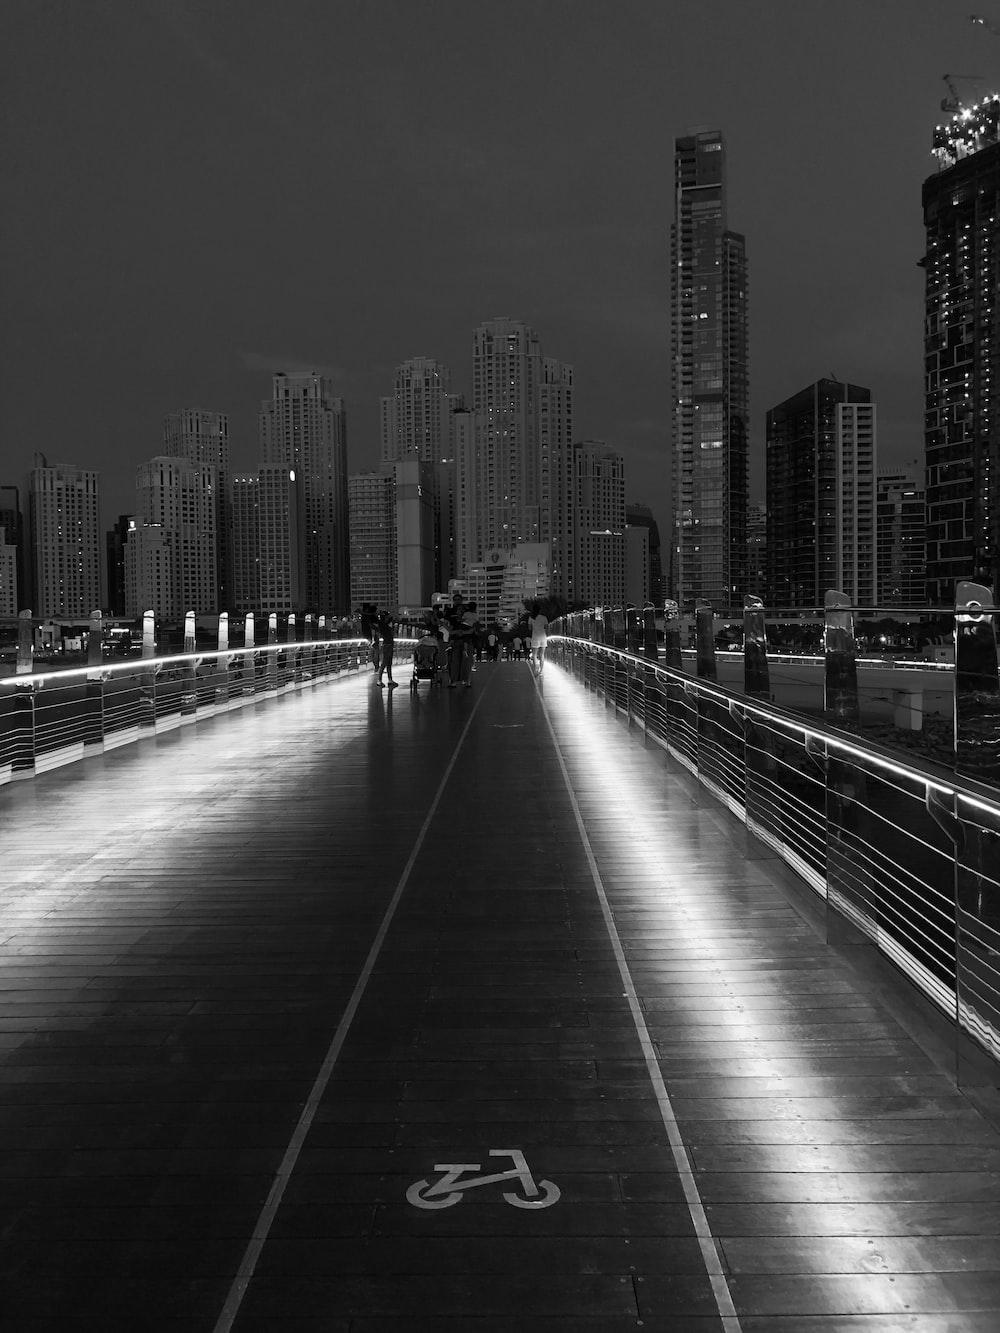 grayscale photo of bridge across city building